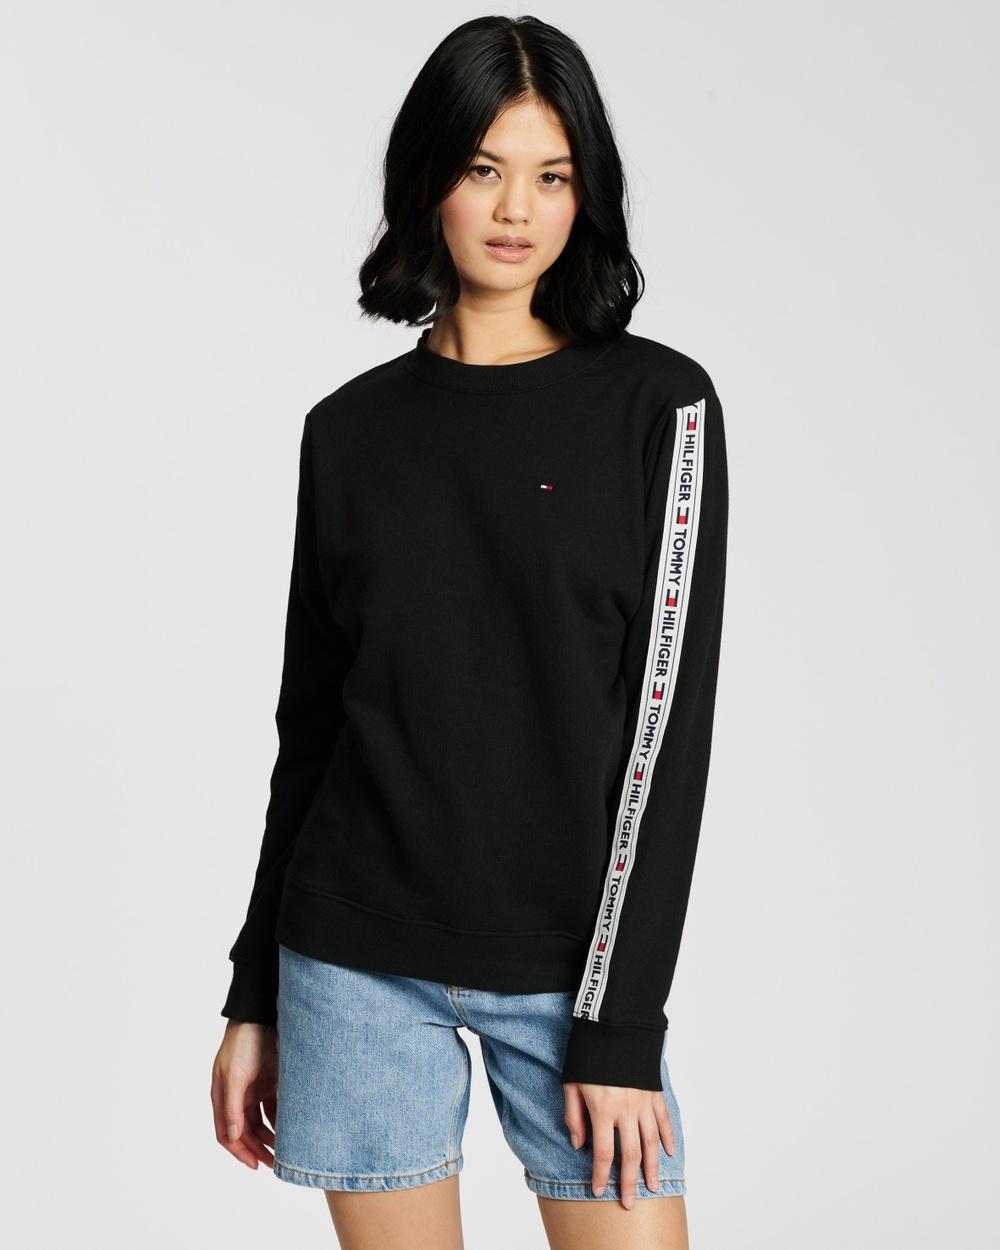 Tommy Hilfiger Logo Tape Sweatshirt Sweats PVH Black